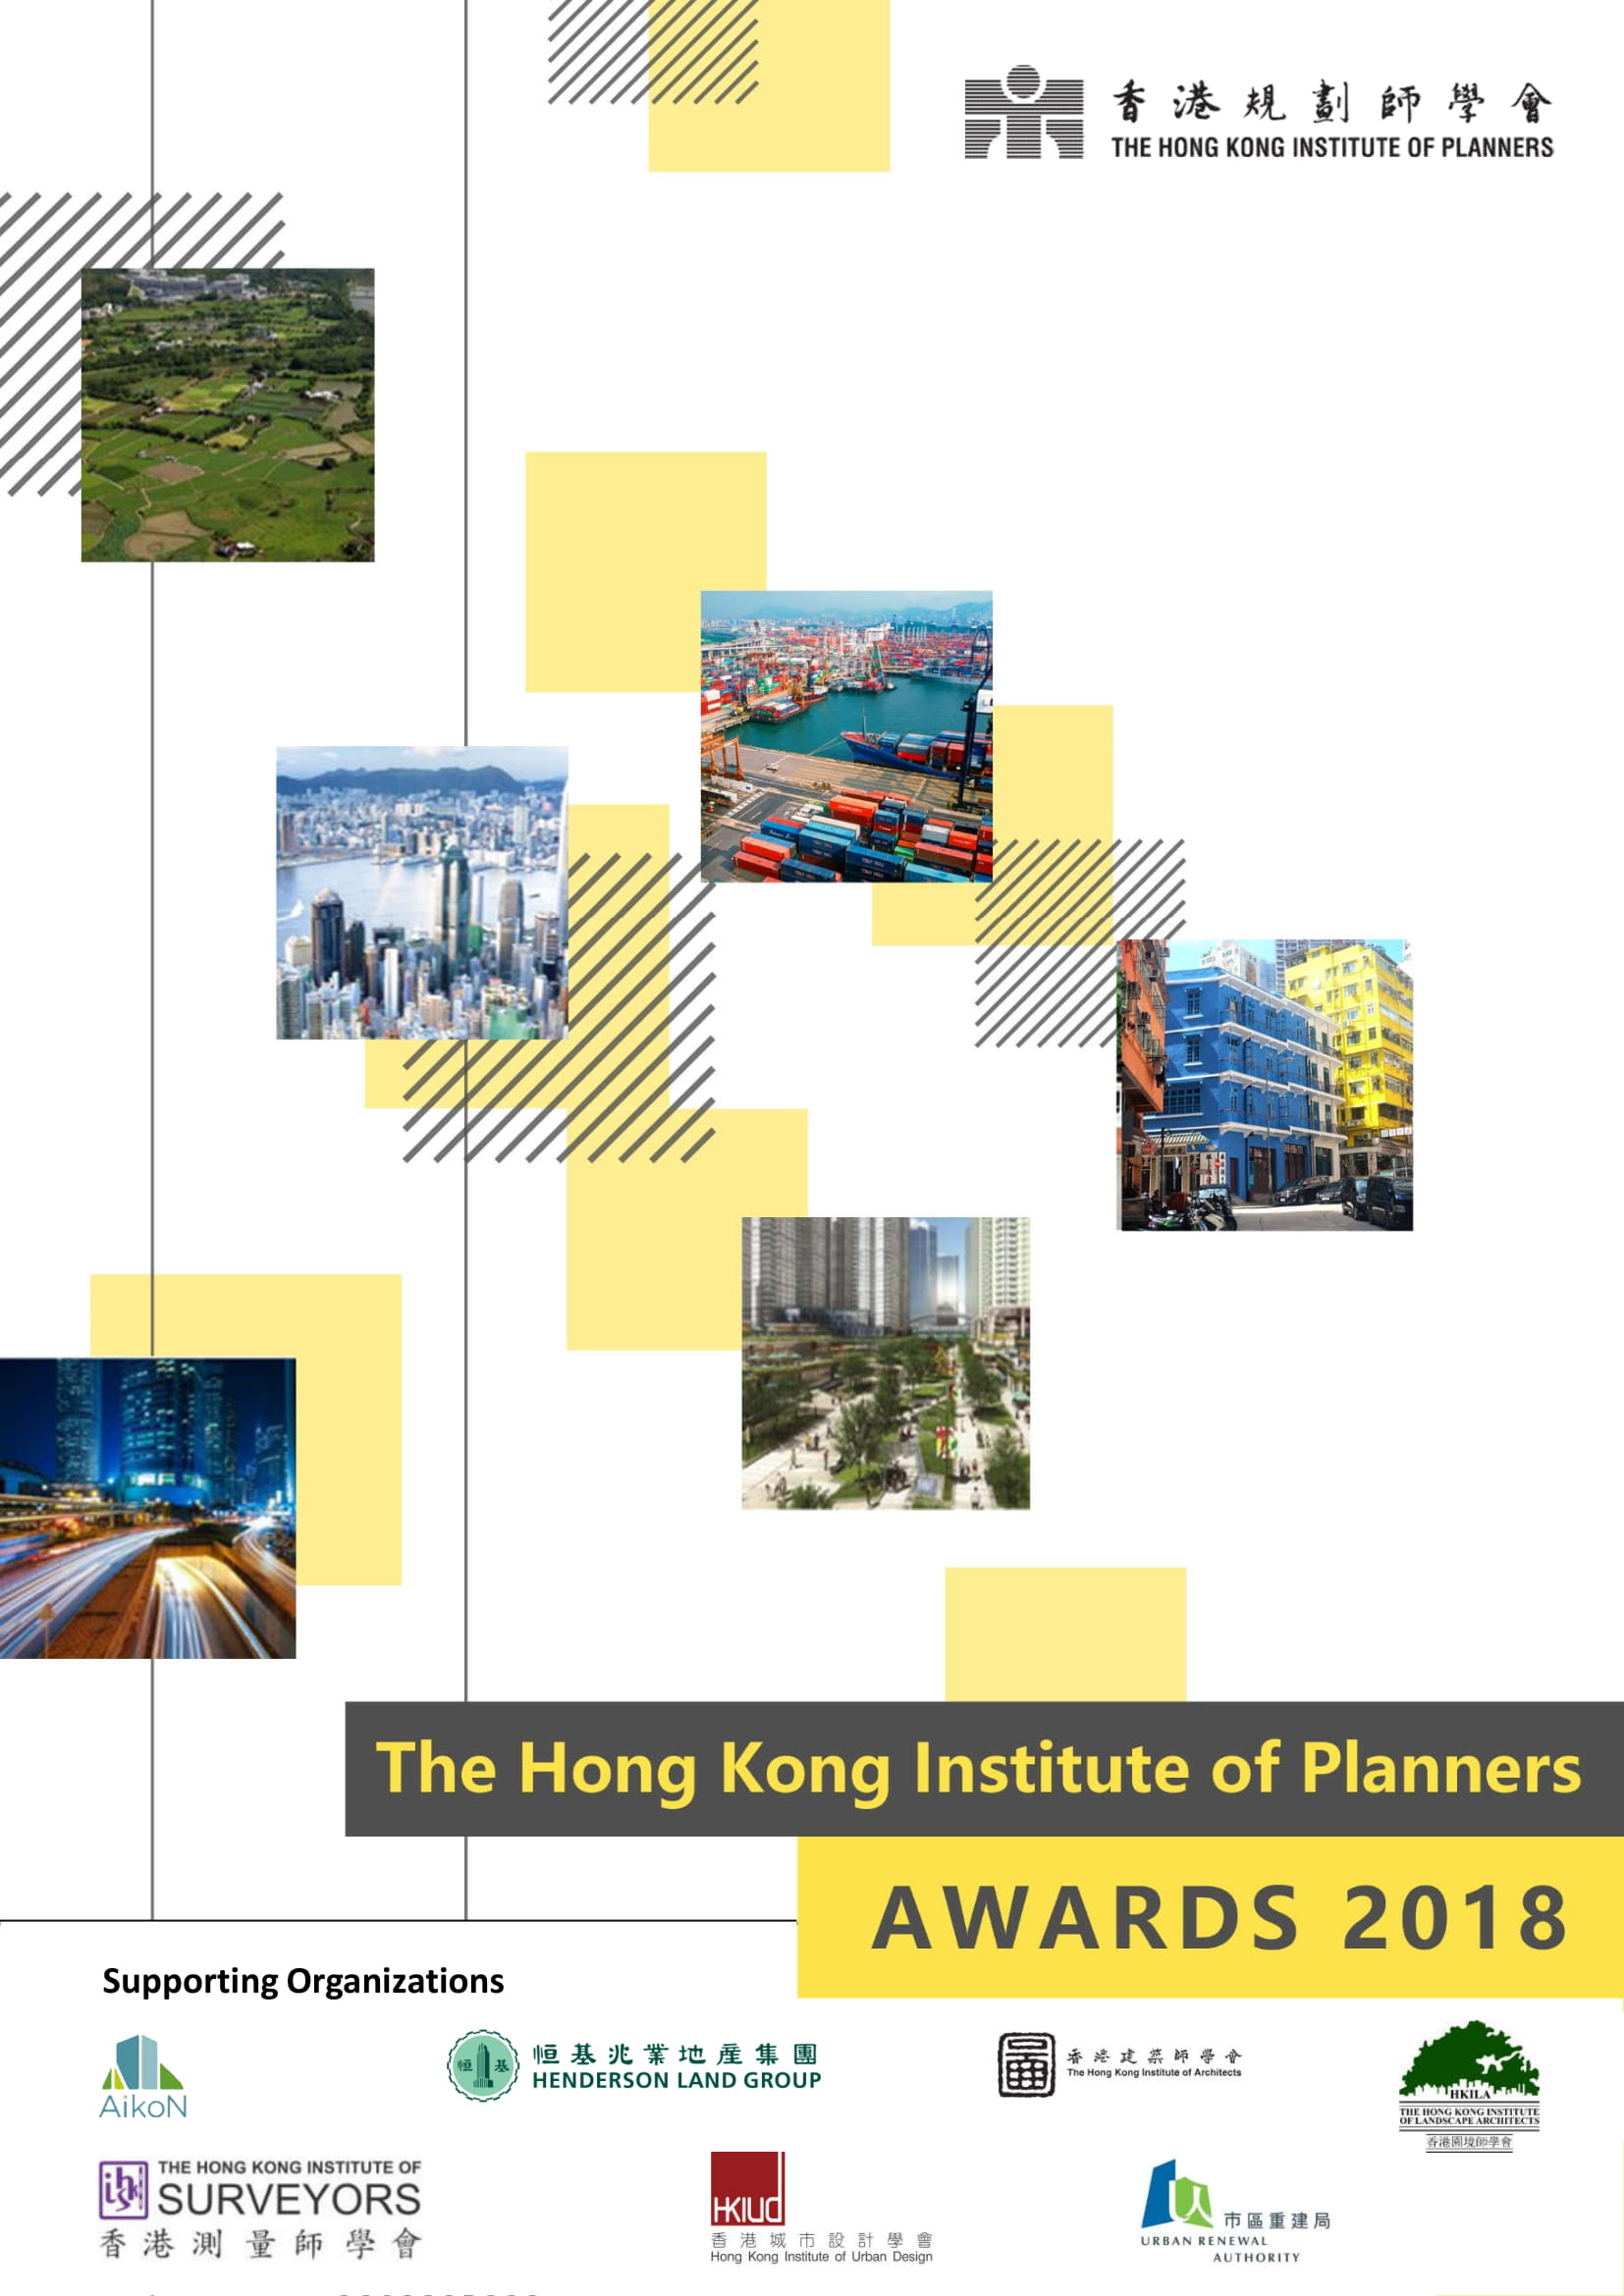 HKIP Awards 2018-Pamphlet-1.jpg